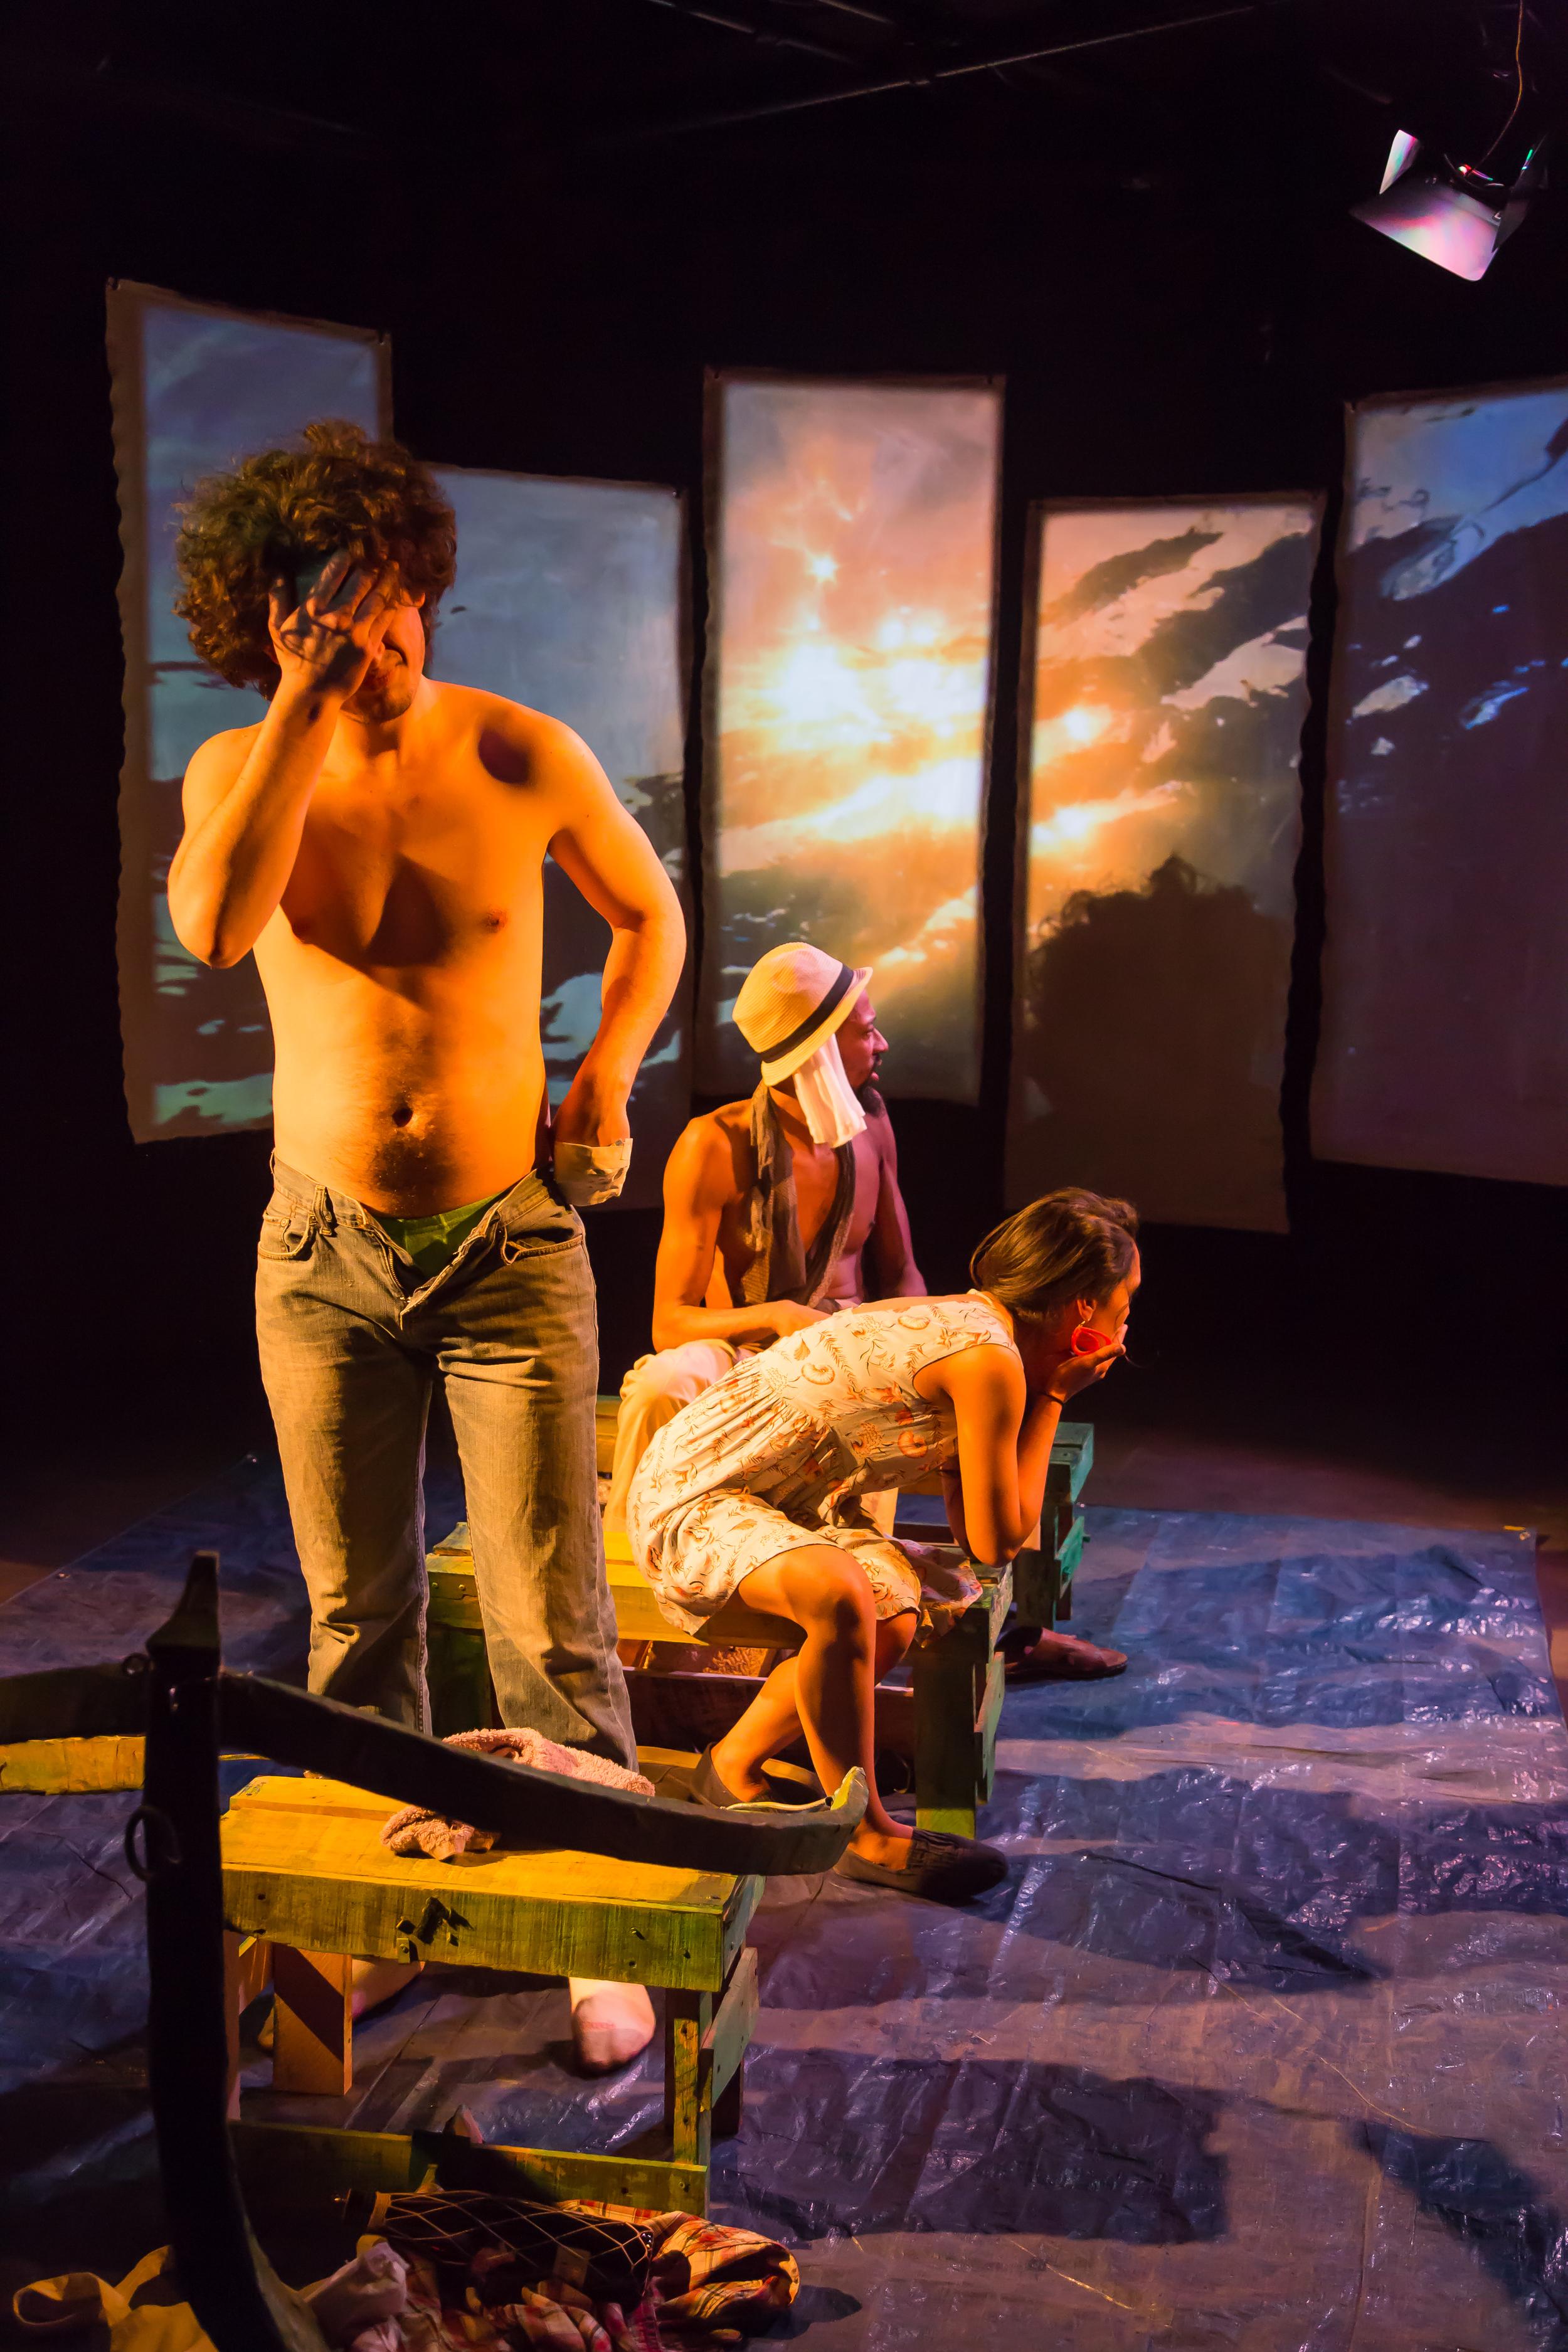 20150320 - Teatrica - Yoleros - Color 0115.jpg